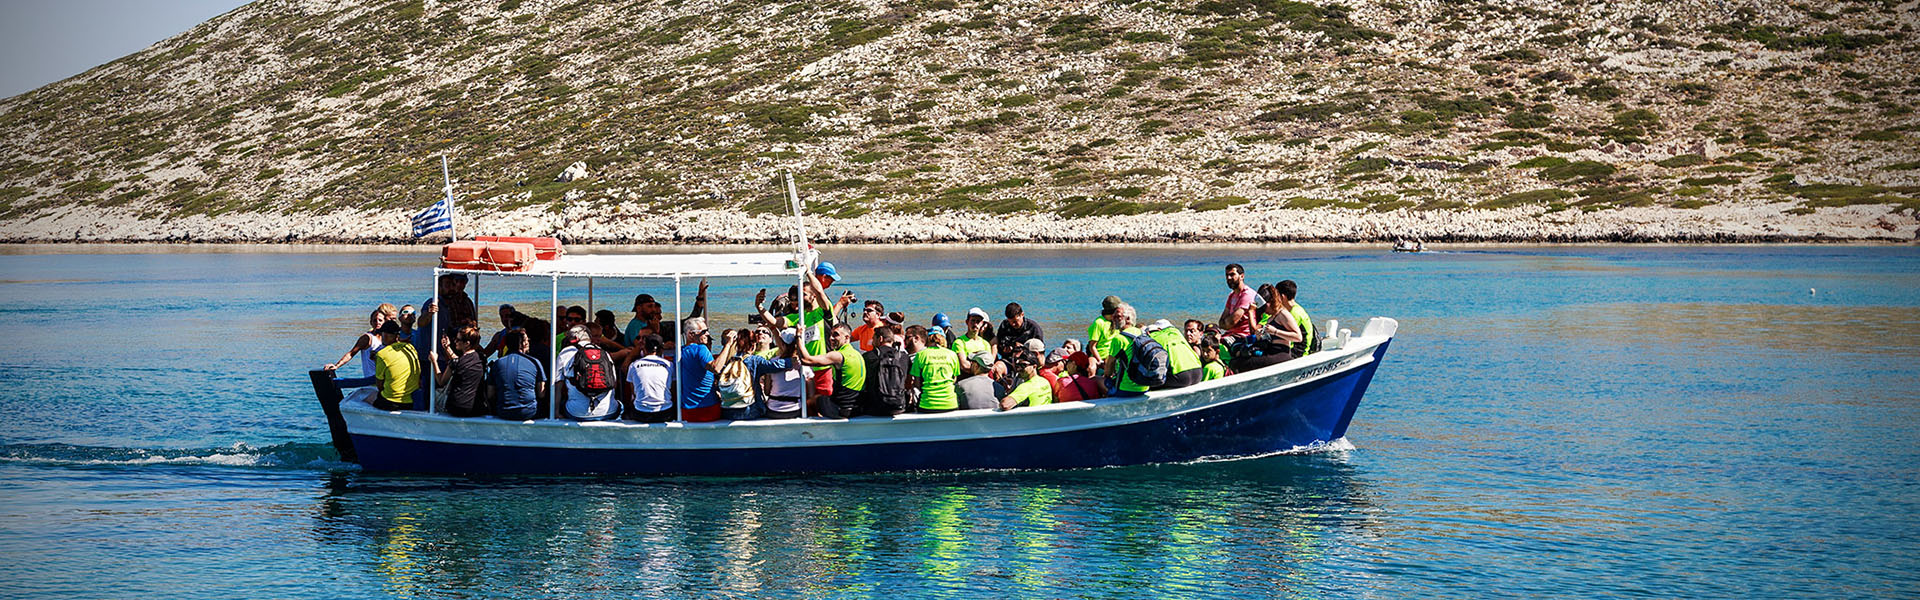 Amorgos Trail Challenge Transfer boat Nikouria